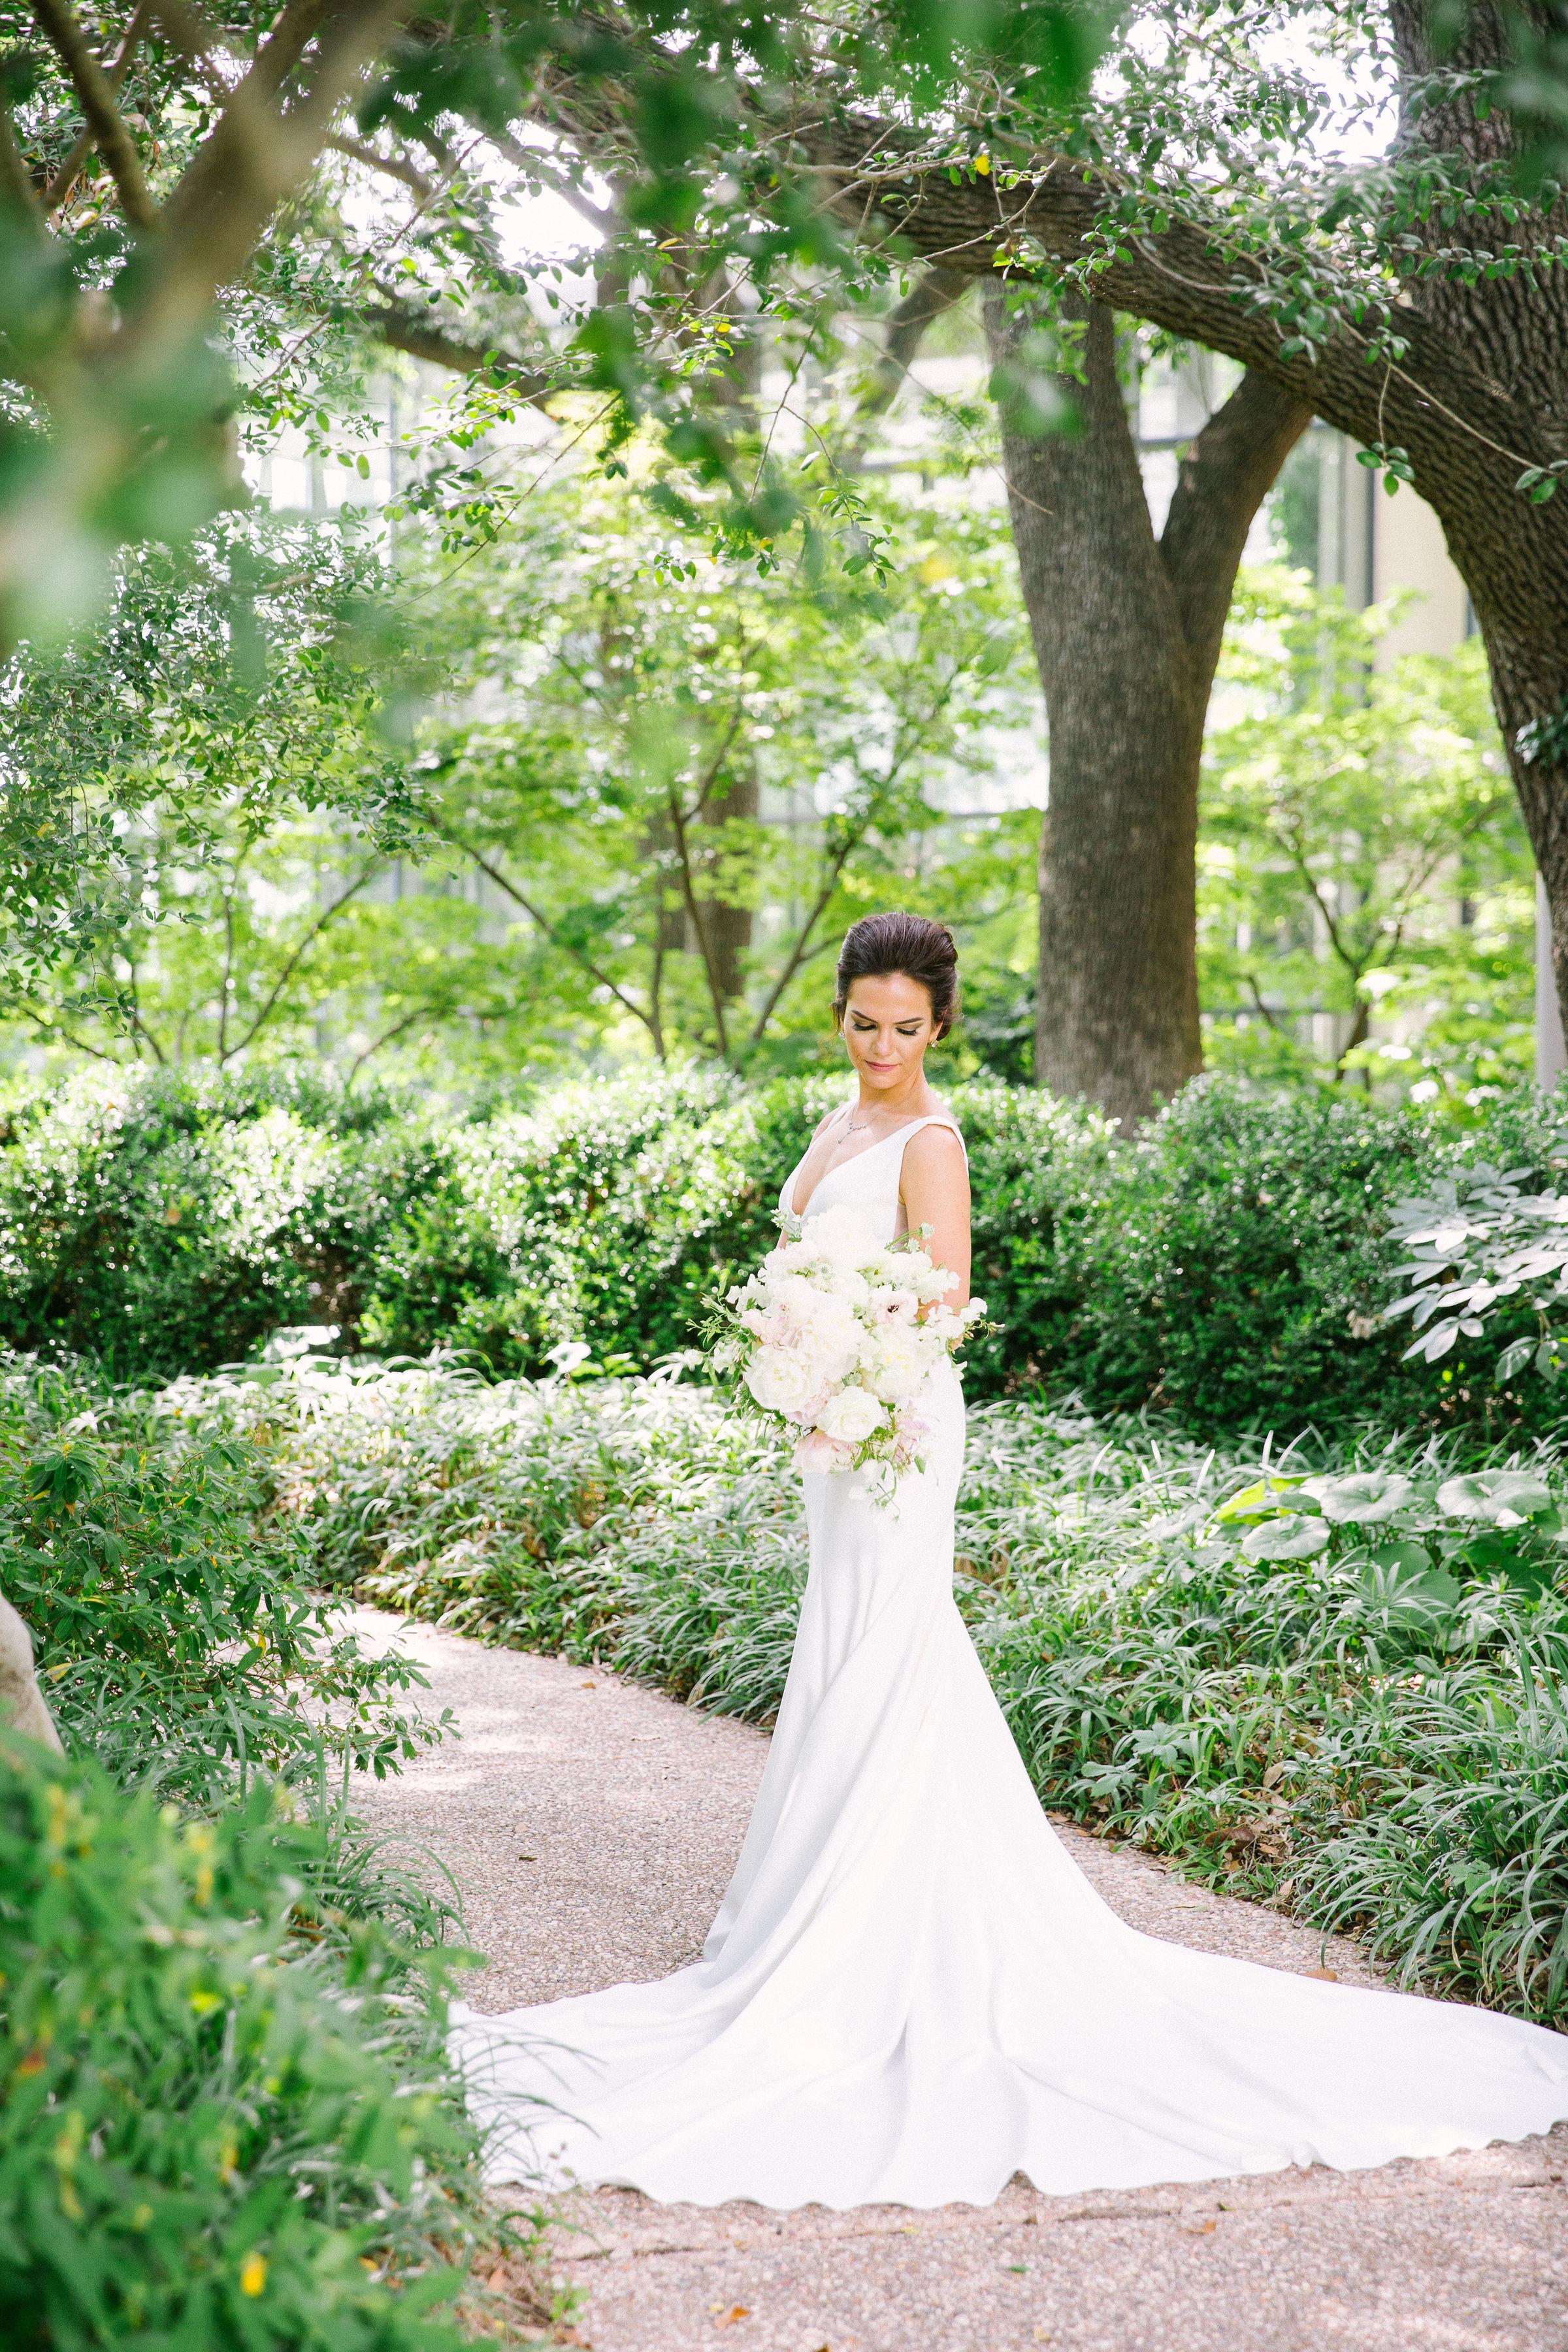 Ellen-Ashton-Photography-Dallas-Wedding-Photographers-Ivory-and-vine-Weddings-779.jpg